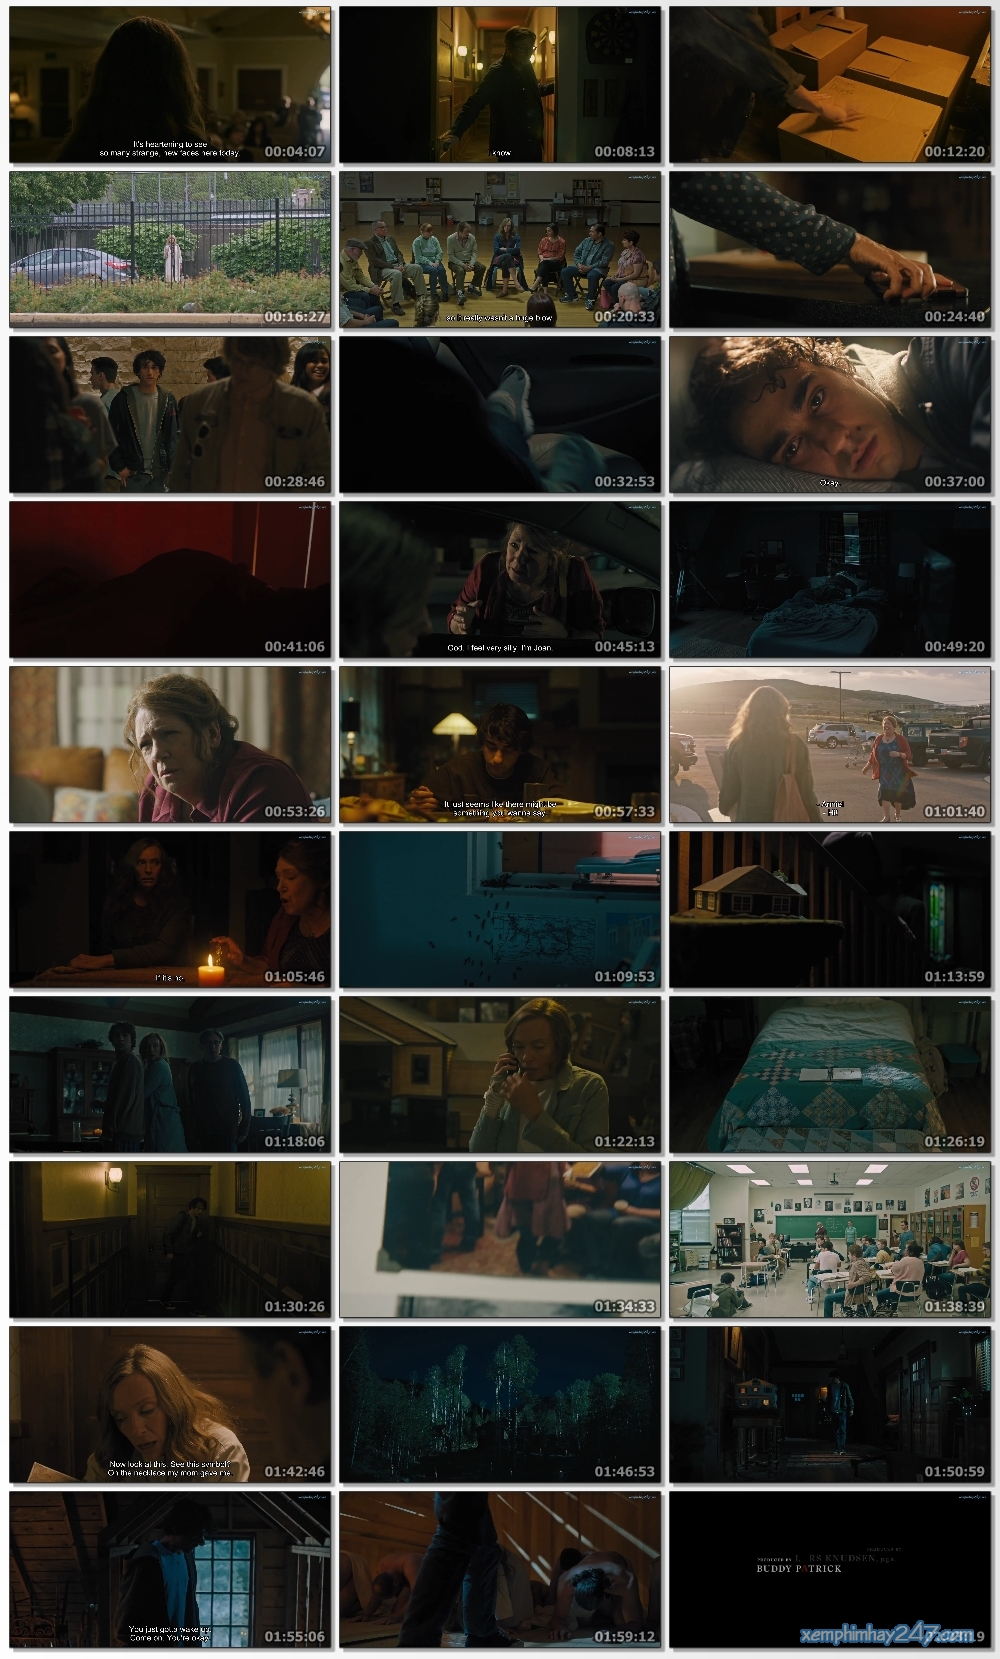 http://xemphimhay247.com - Xem phim hay 247 - Di Truyền (2018) - Hereditary (2018)